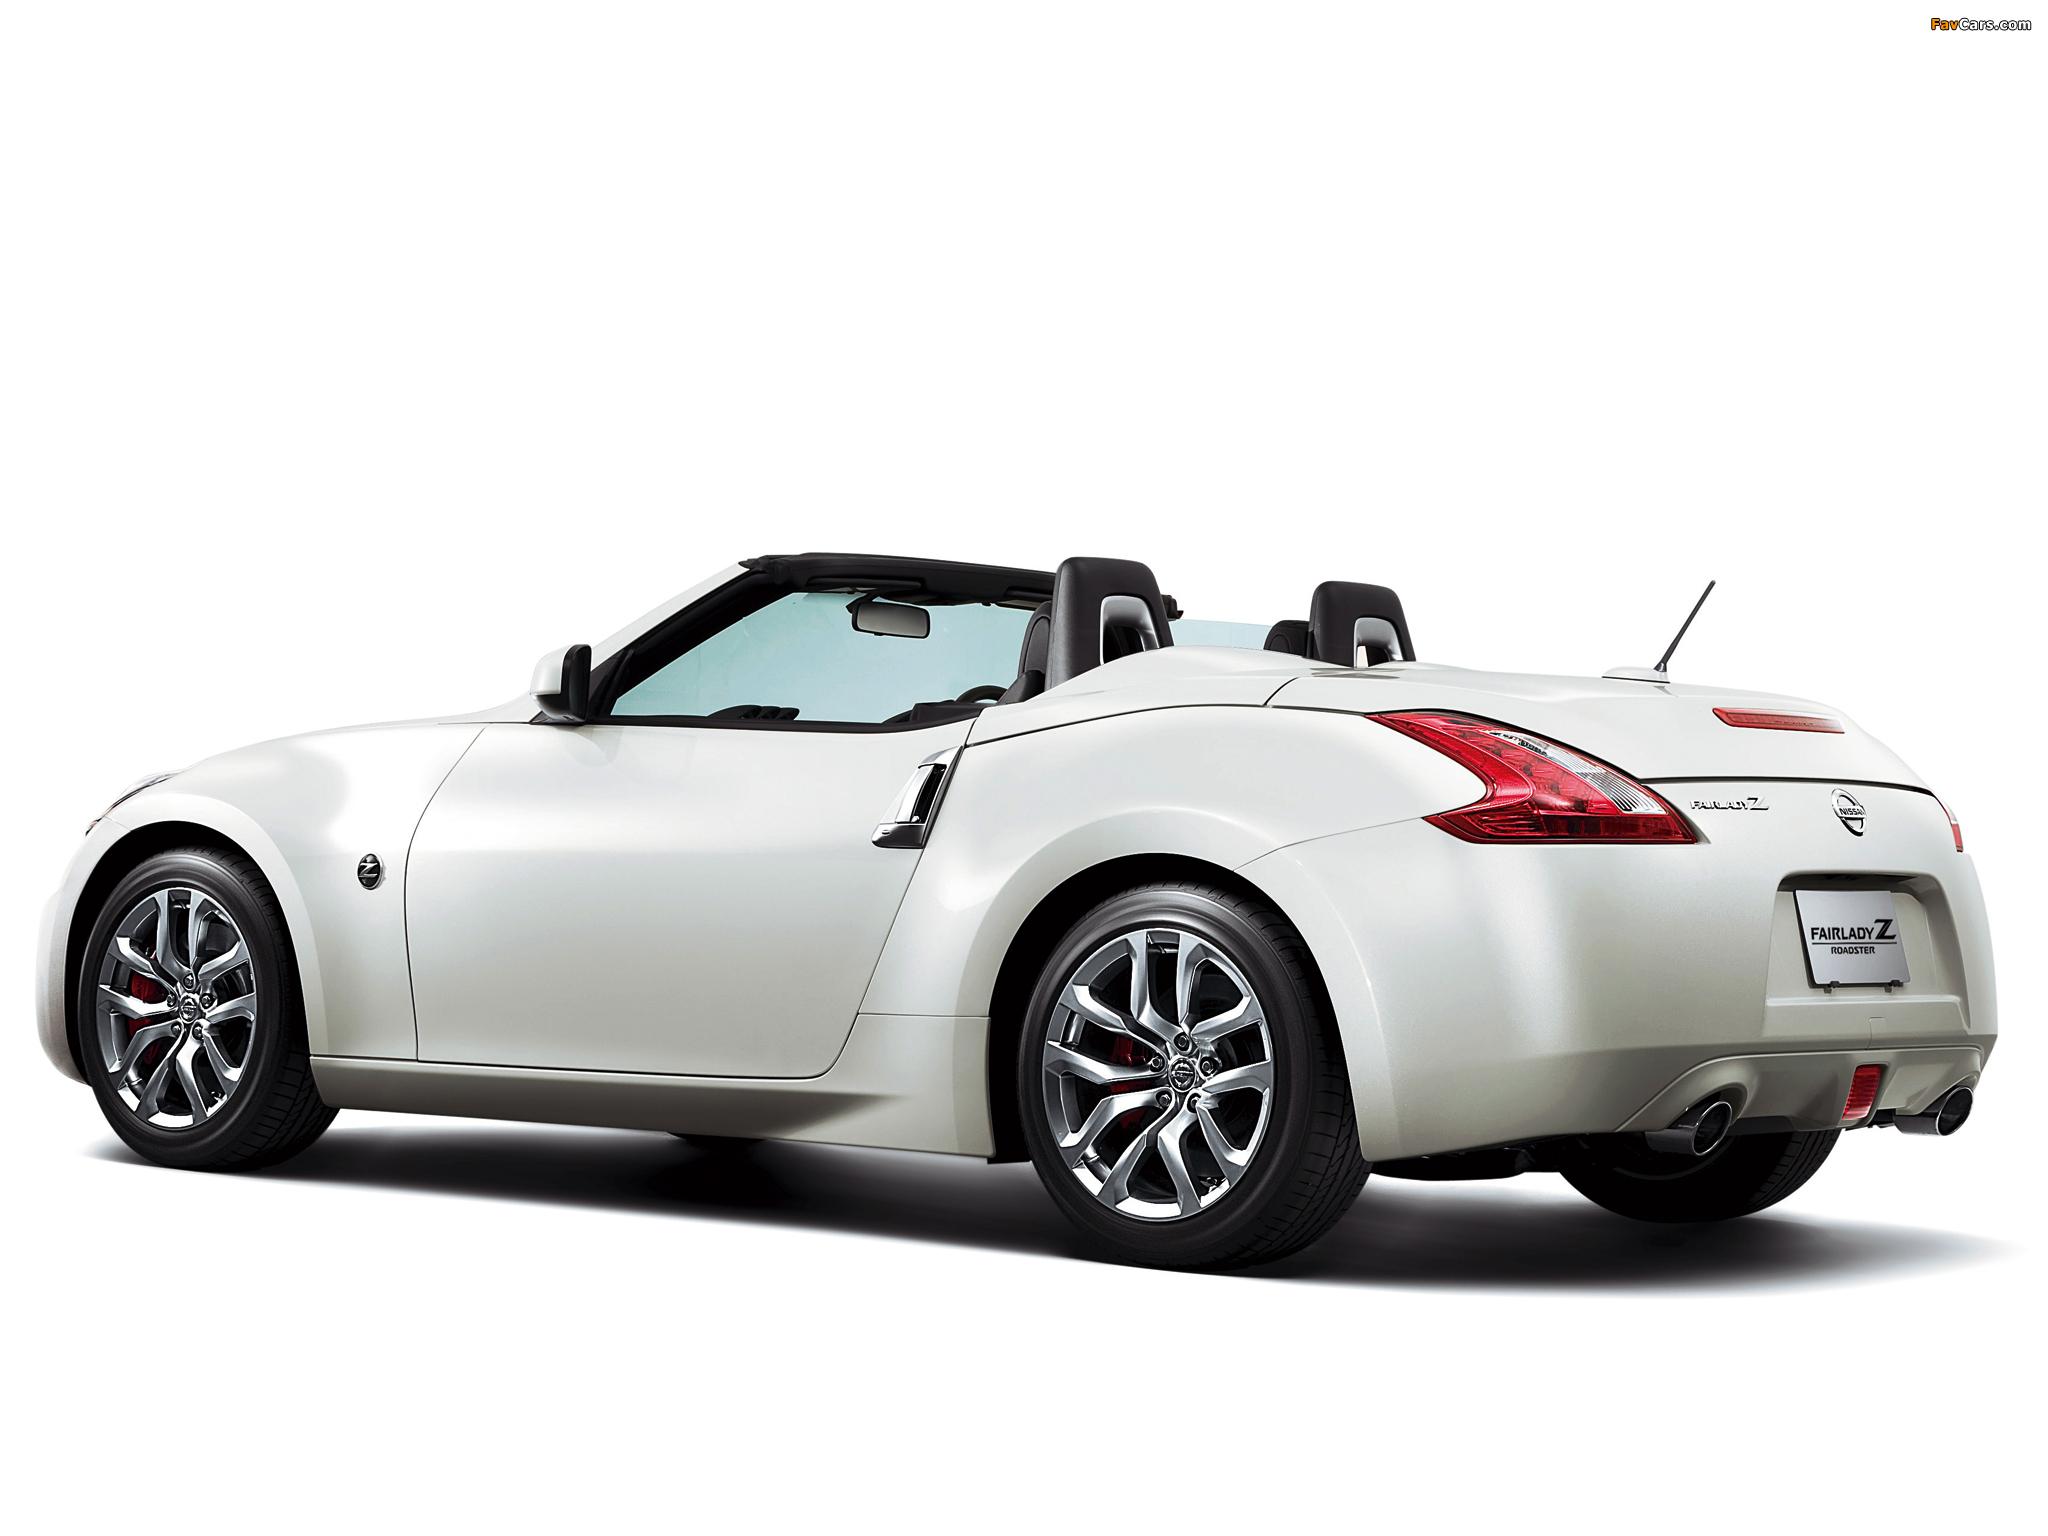 Nissan Fairlady Z >> Nissan Fairlady Z Roadster 2012 pictures (2048x1536)